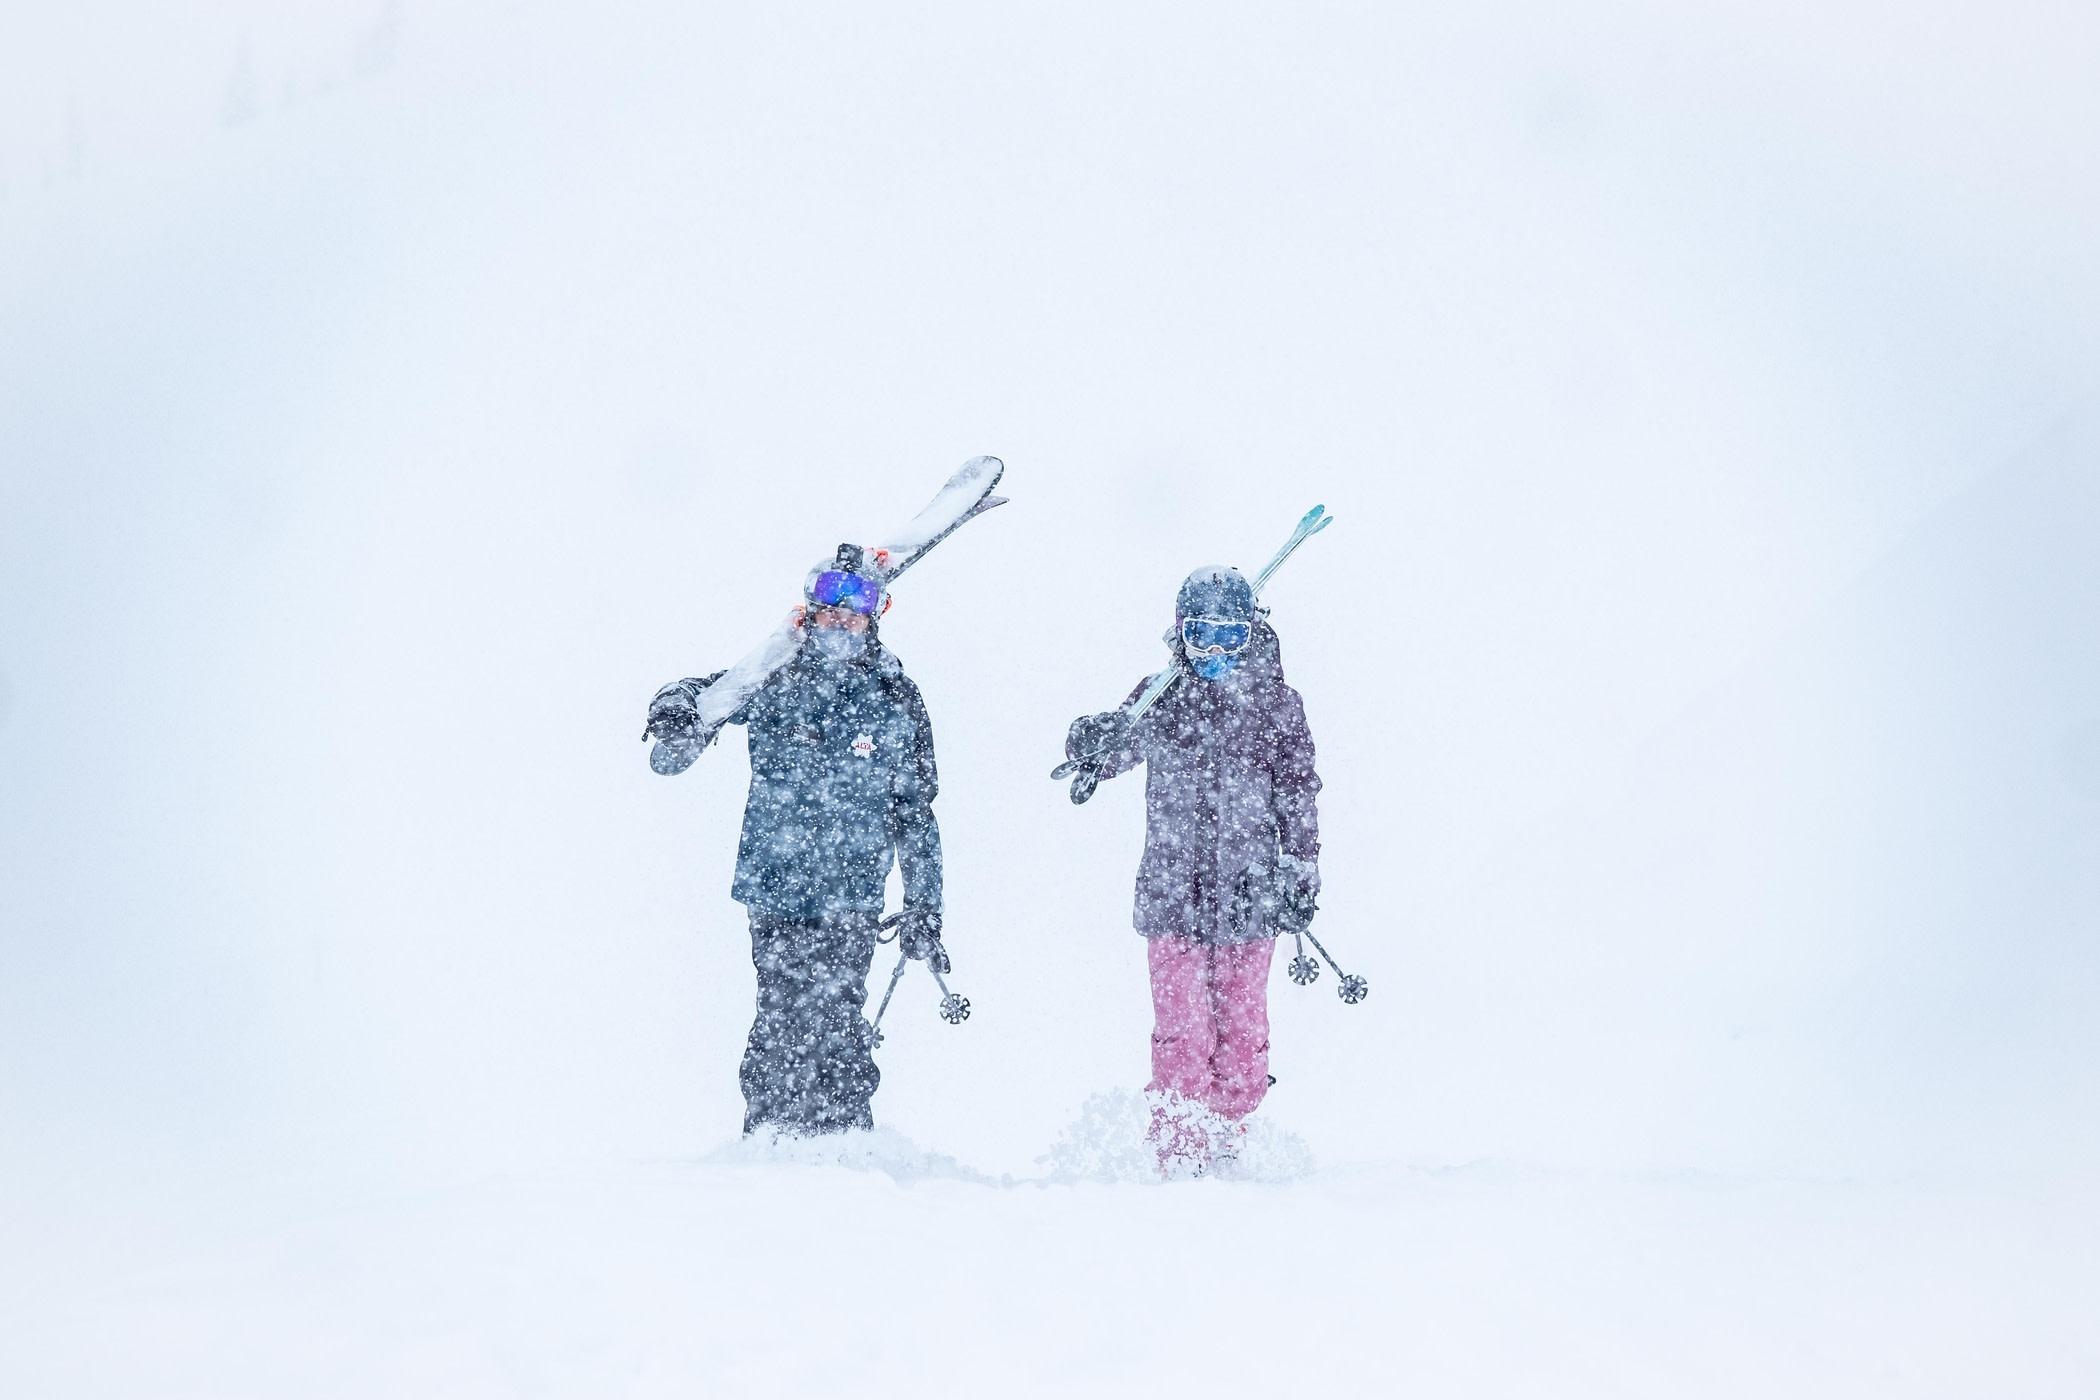 Skiers walking through a Saturday snowstorm at Alta